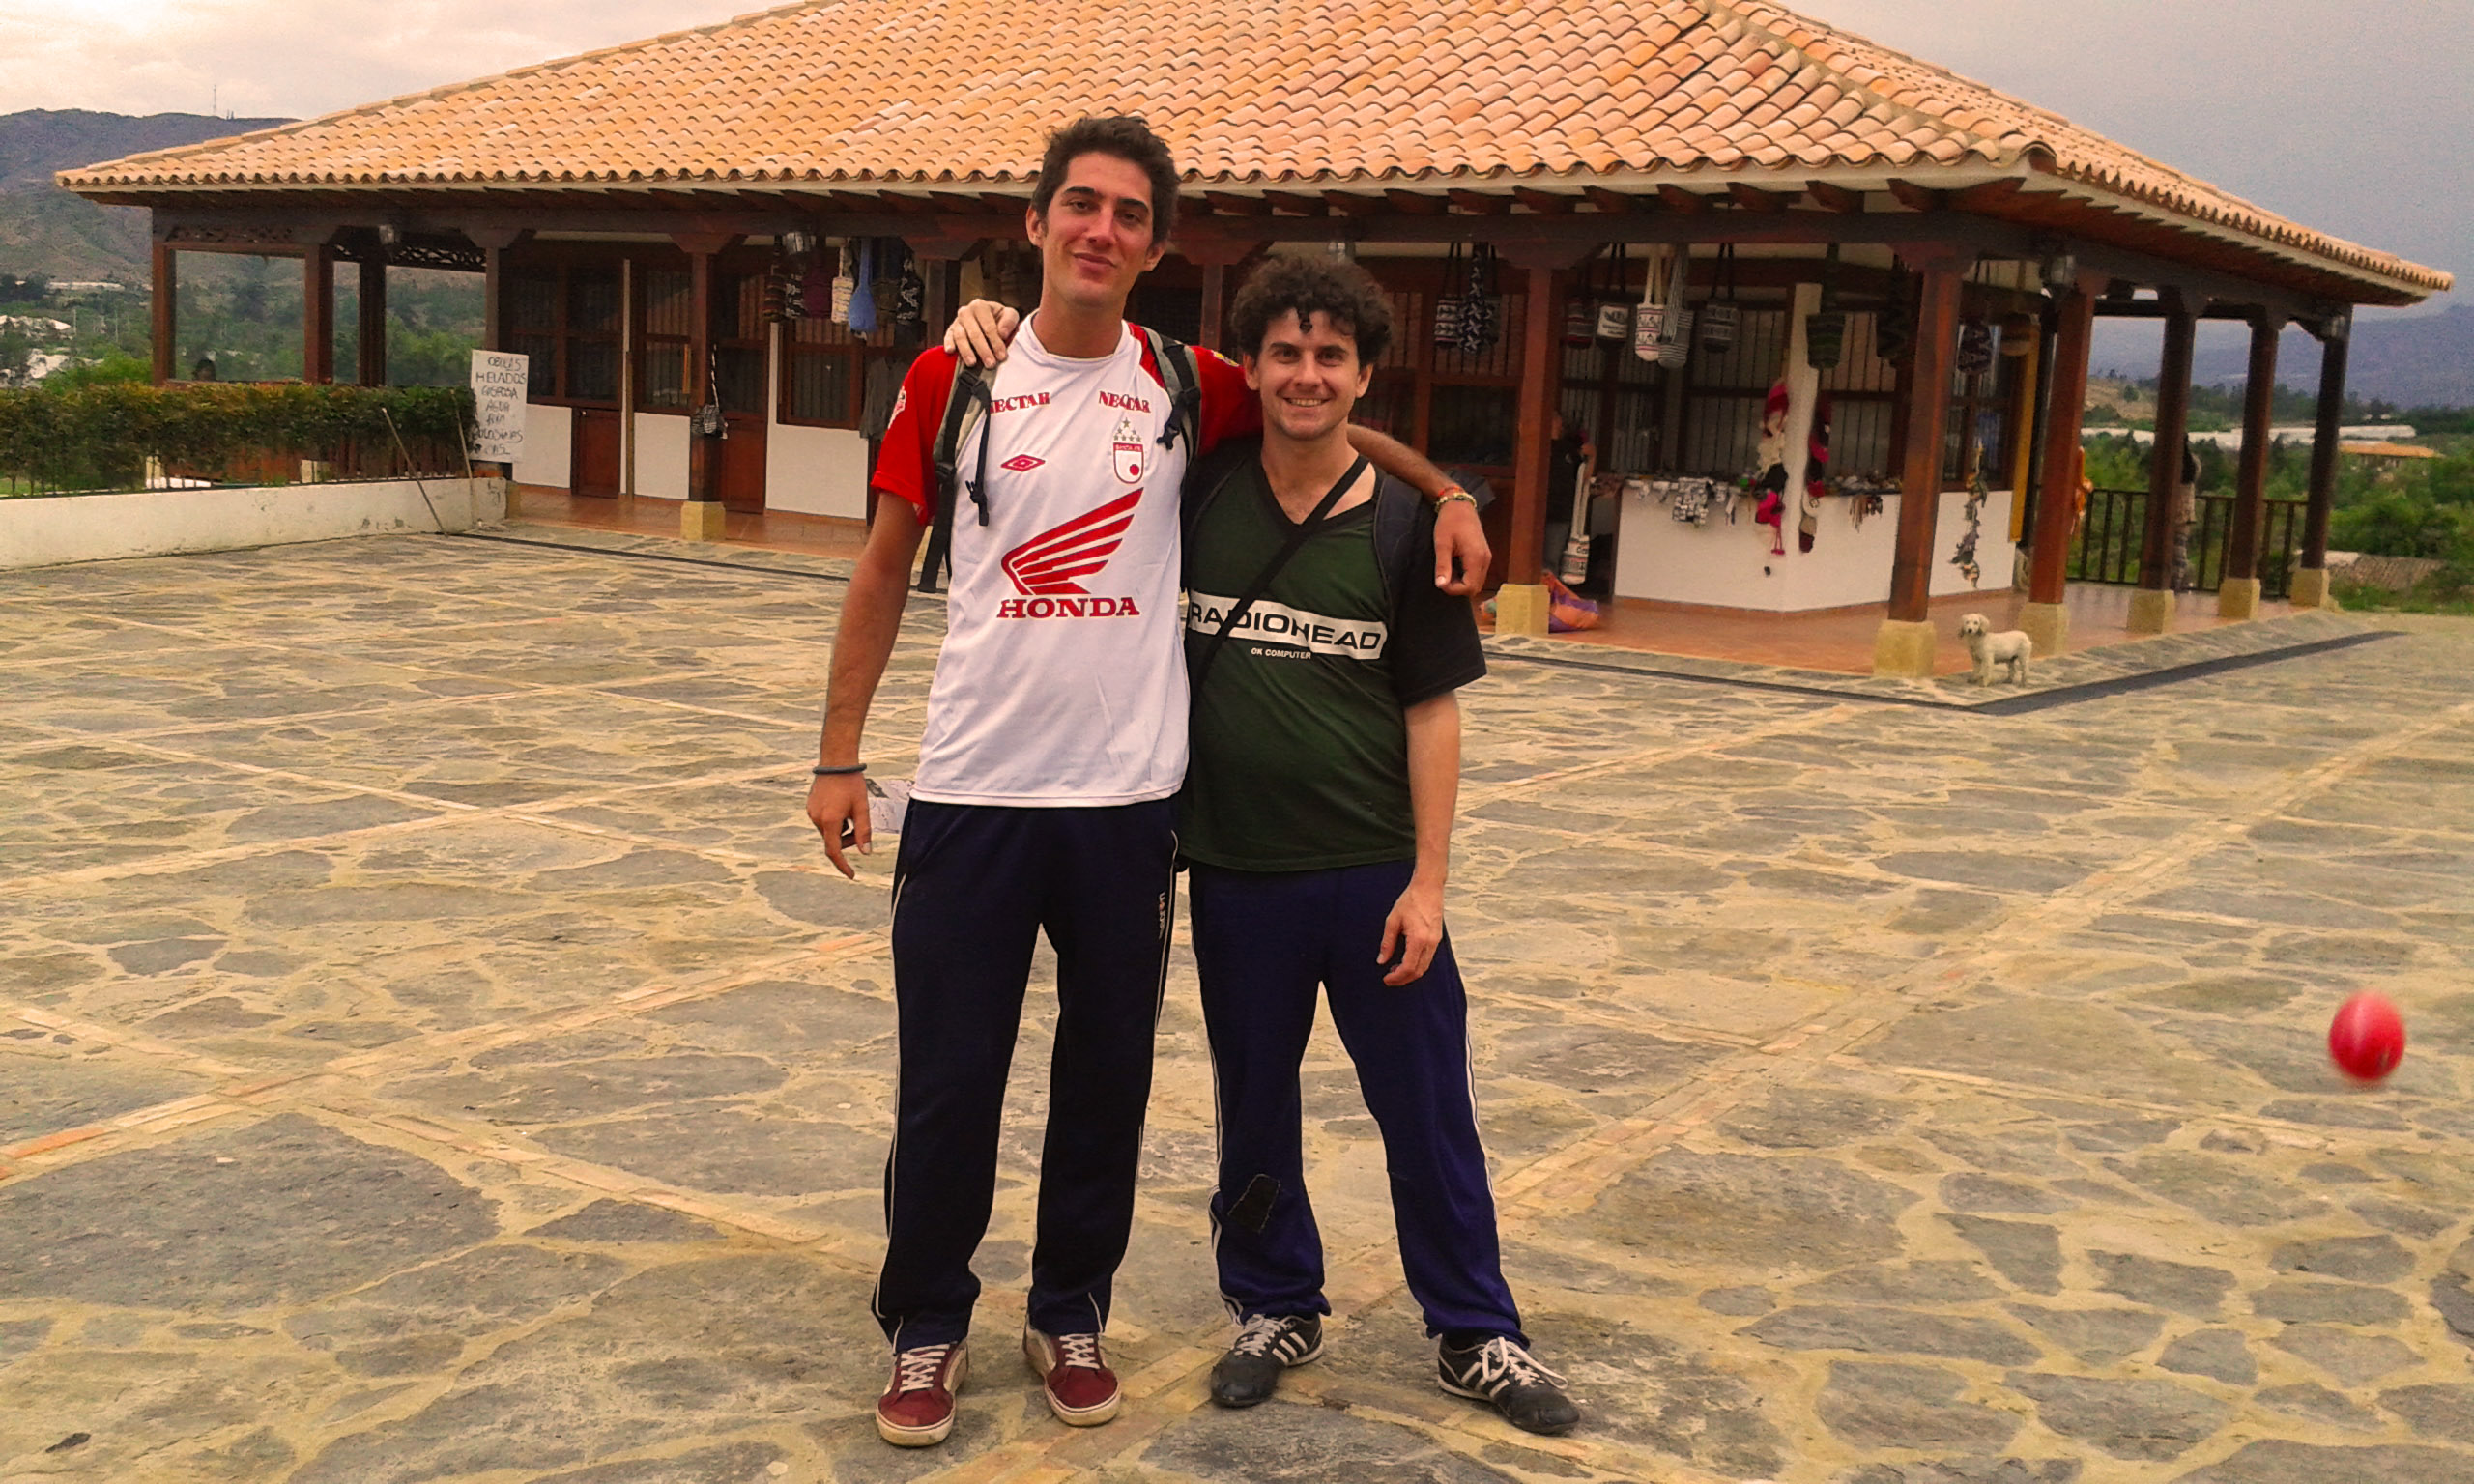 Elviio&Gianmarco